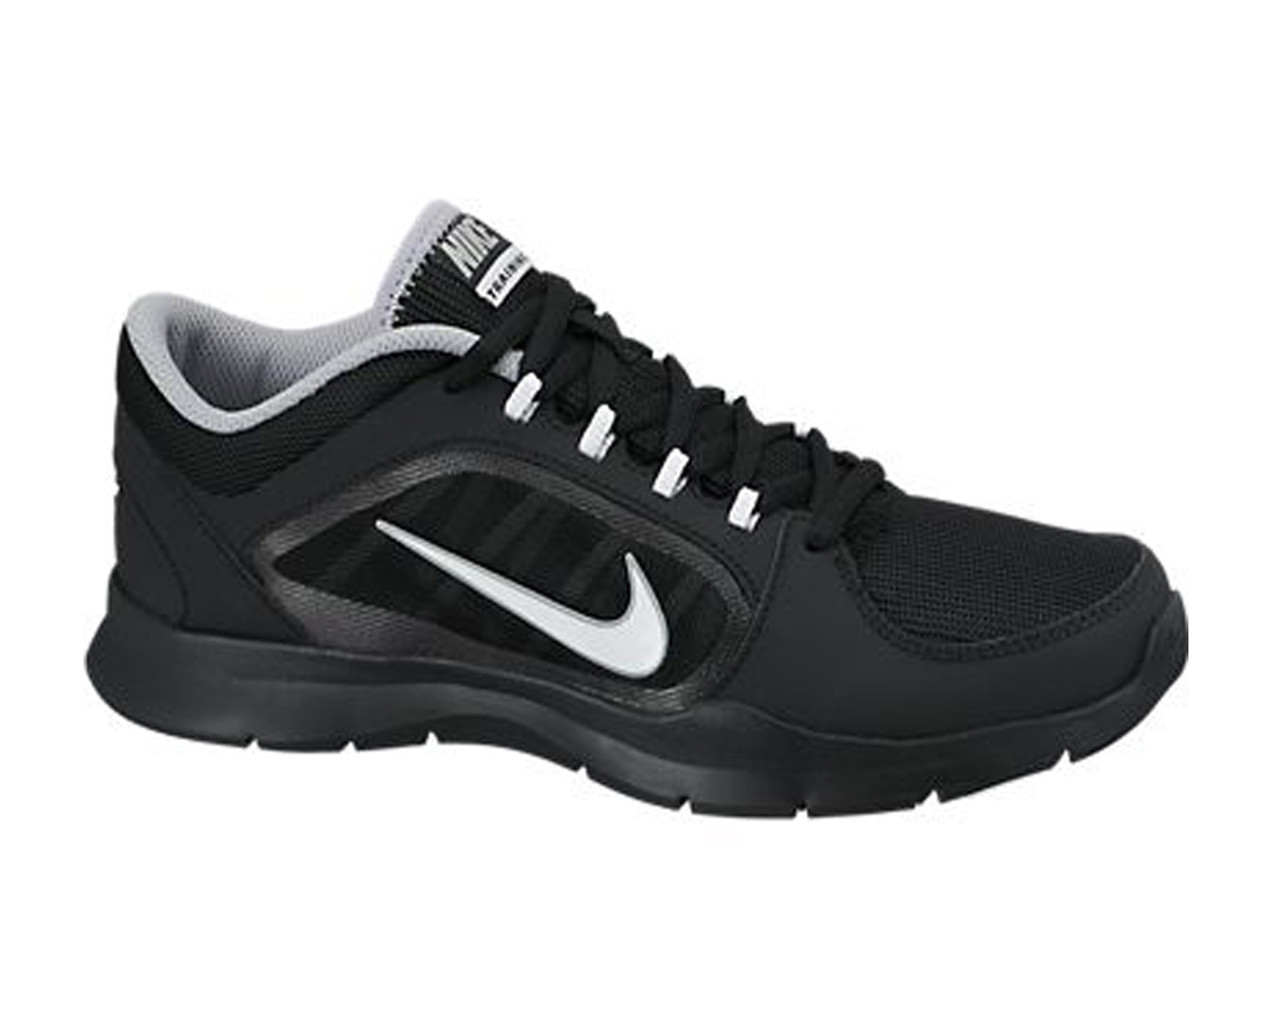 9a85b31c133d Nike Women s Flex Trainer 4 Cross Trainer Black White - Shop now   Shoolu.